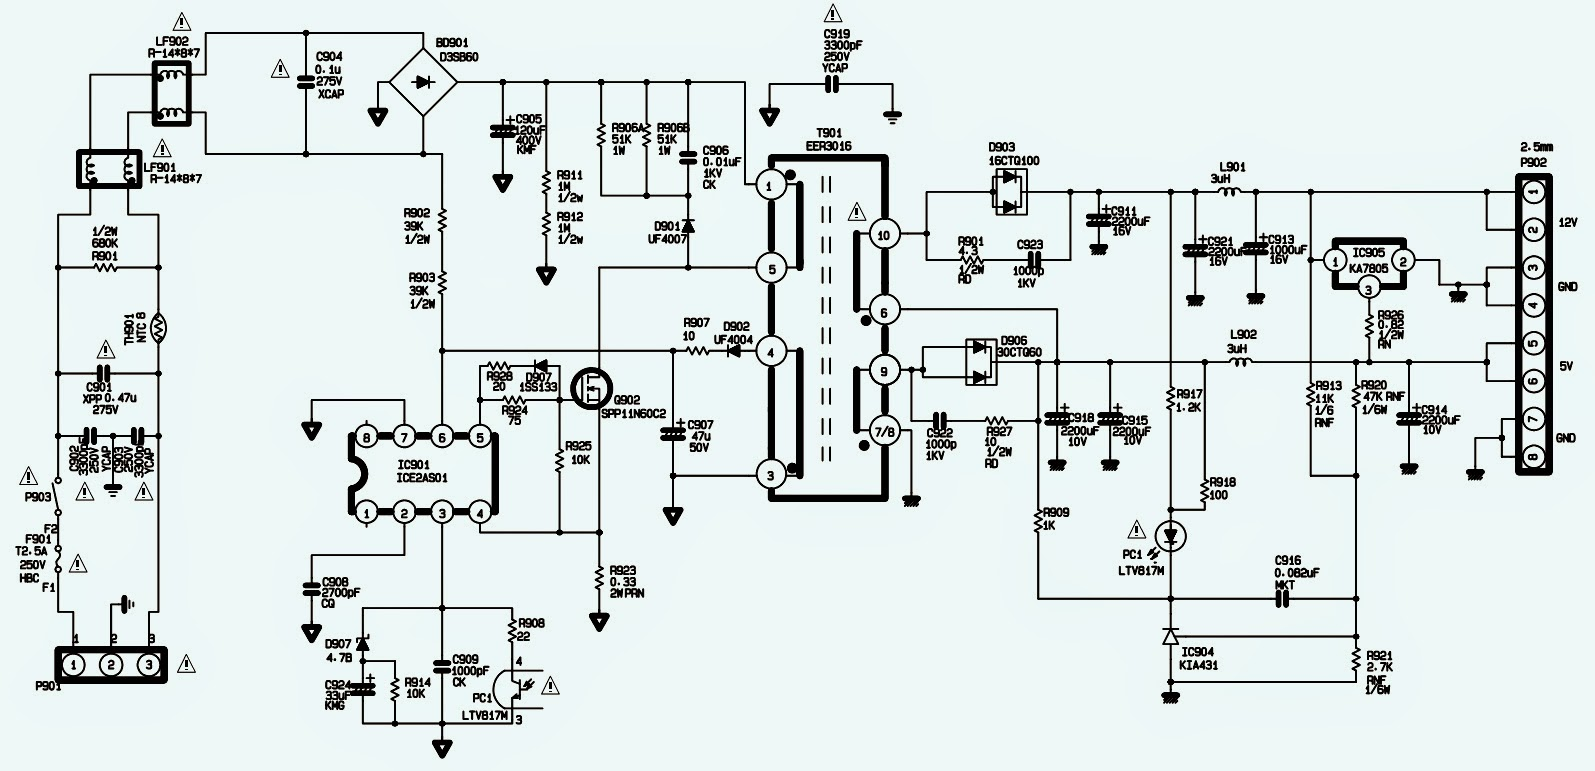 wiring schematic diagram lg flatron l1810b monitor smps schematic power supply wiring diagram schematic [ 1595 x 771 Pixel ]